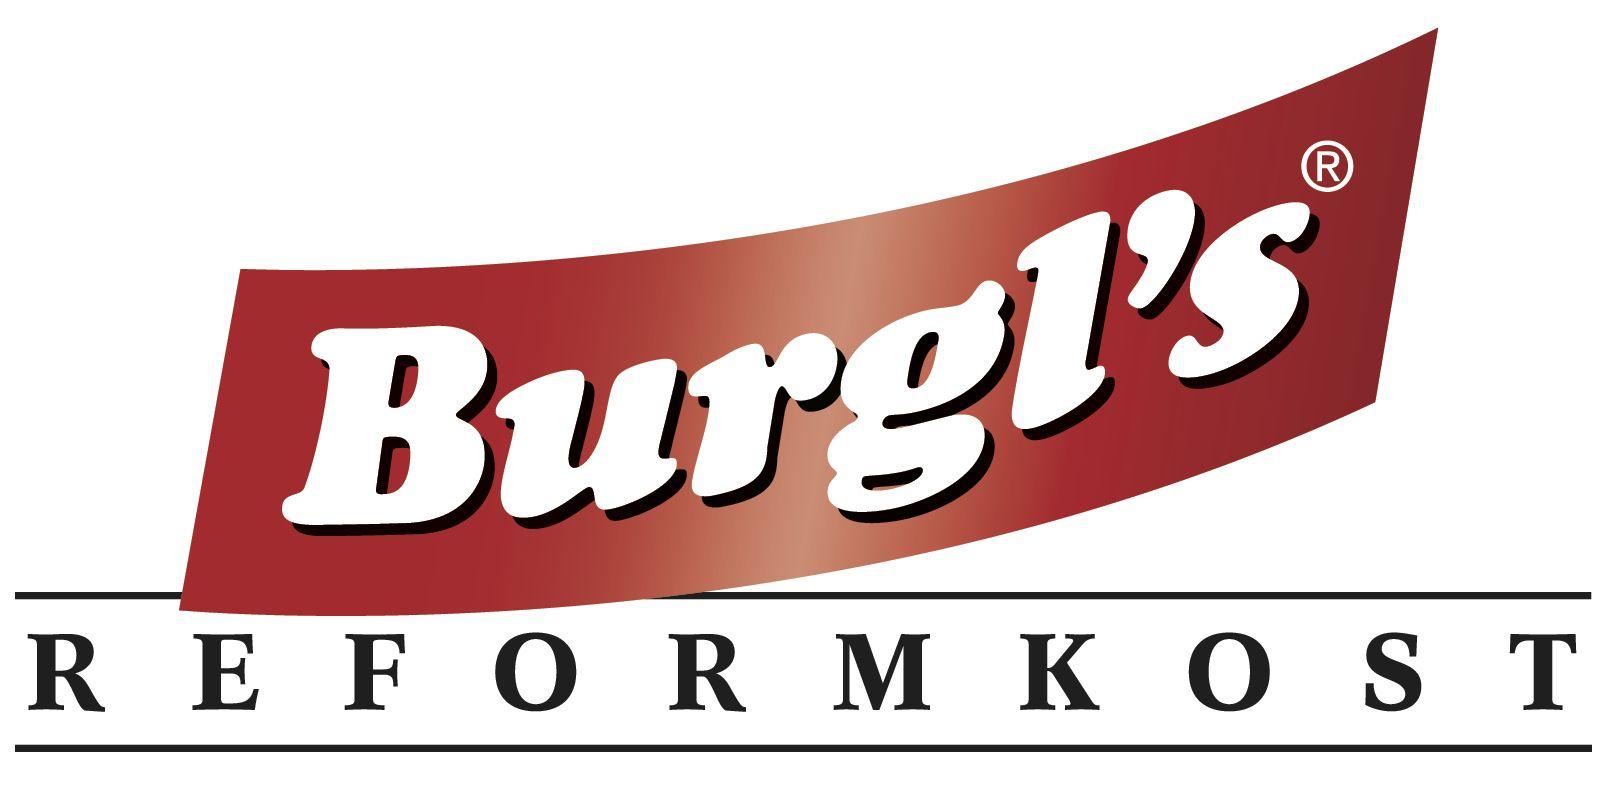 Burgl's Reformkost